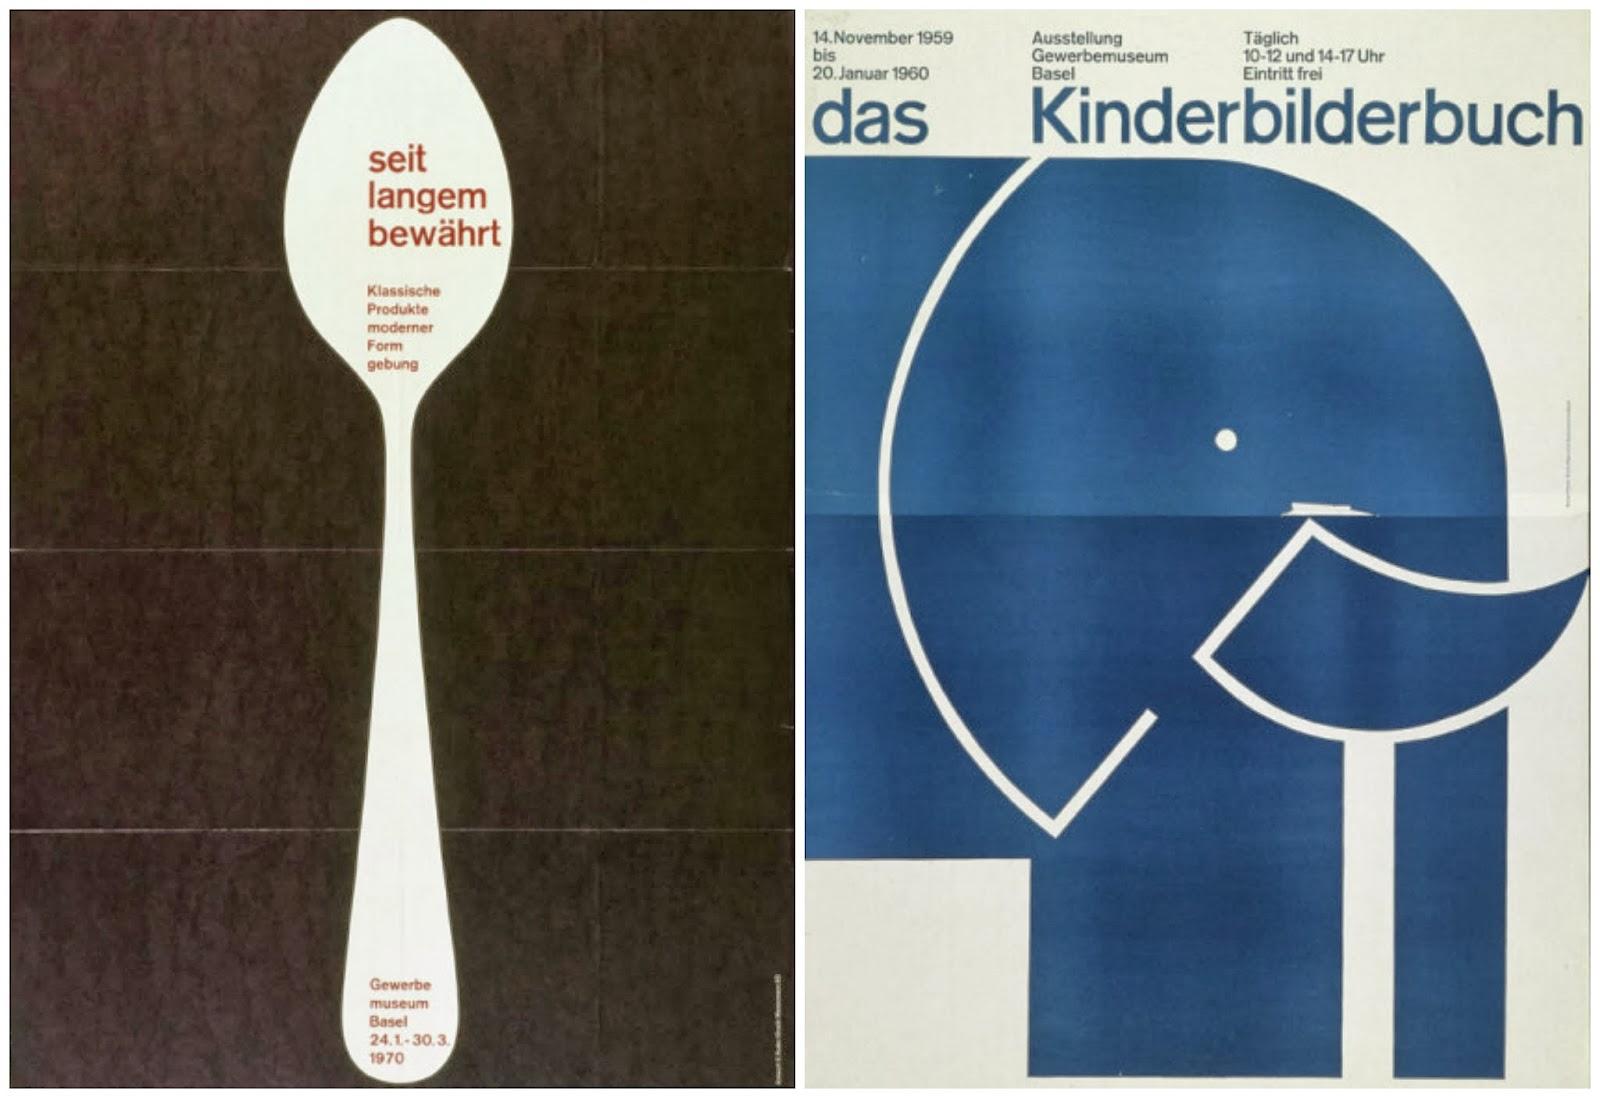 emil ruder el lissitzky essay hnd graphic design emil ruder el lissitzky essay